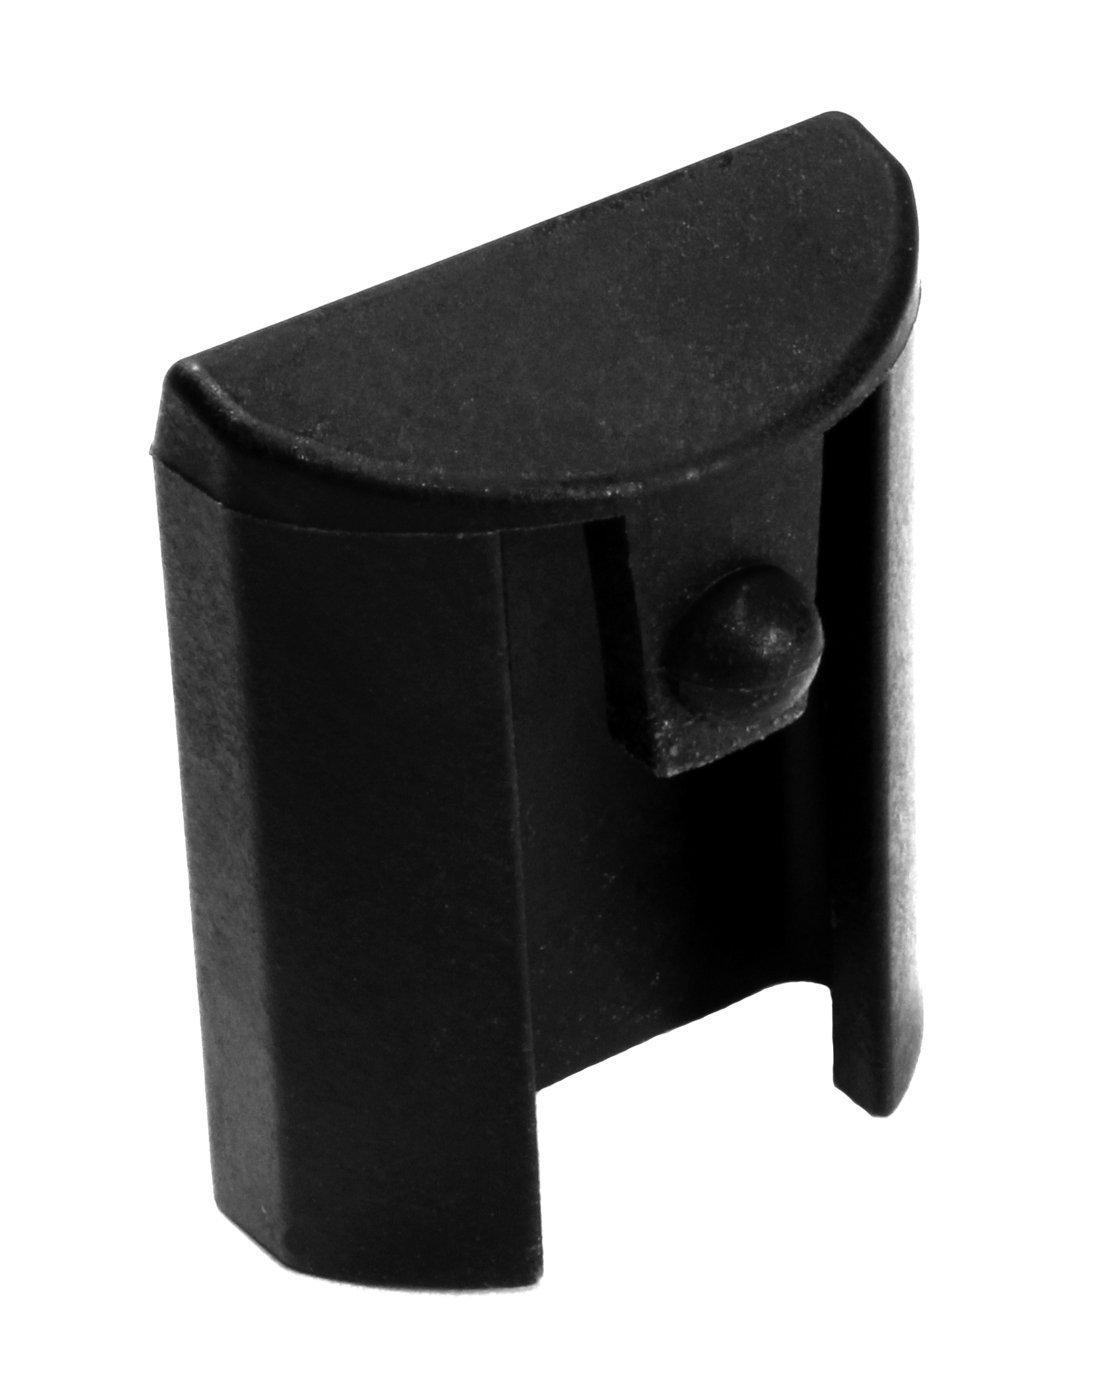 fixxxer Gen 4 Grip Marco Plug para Glock 17 19 22 23 31 34 35 ...